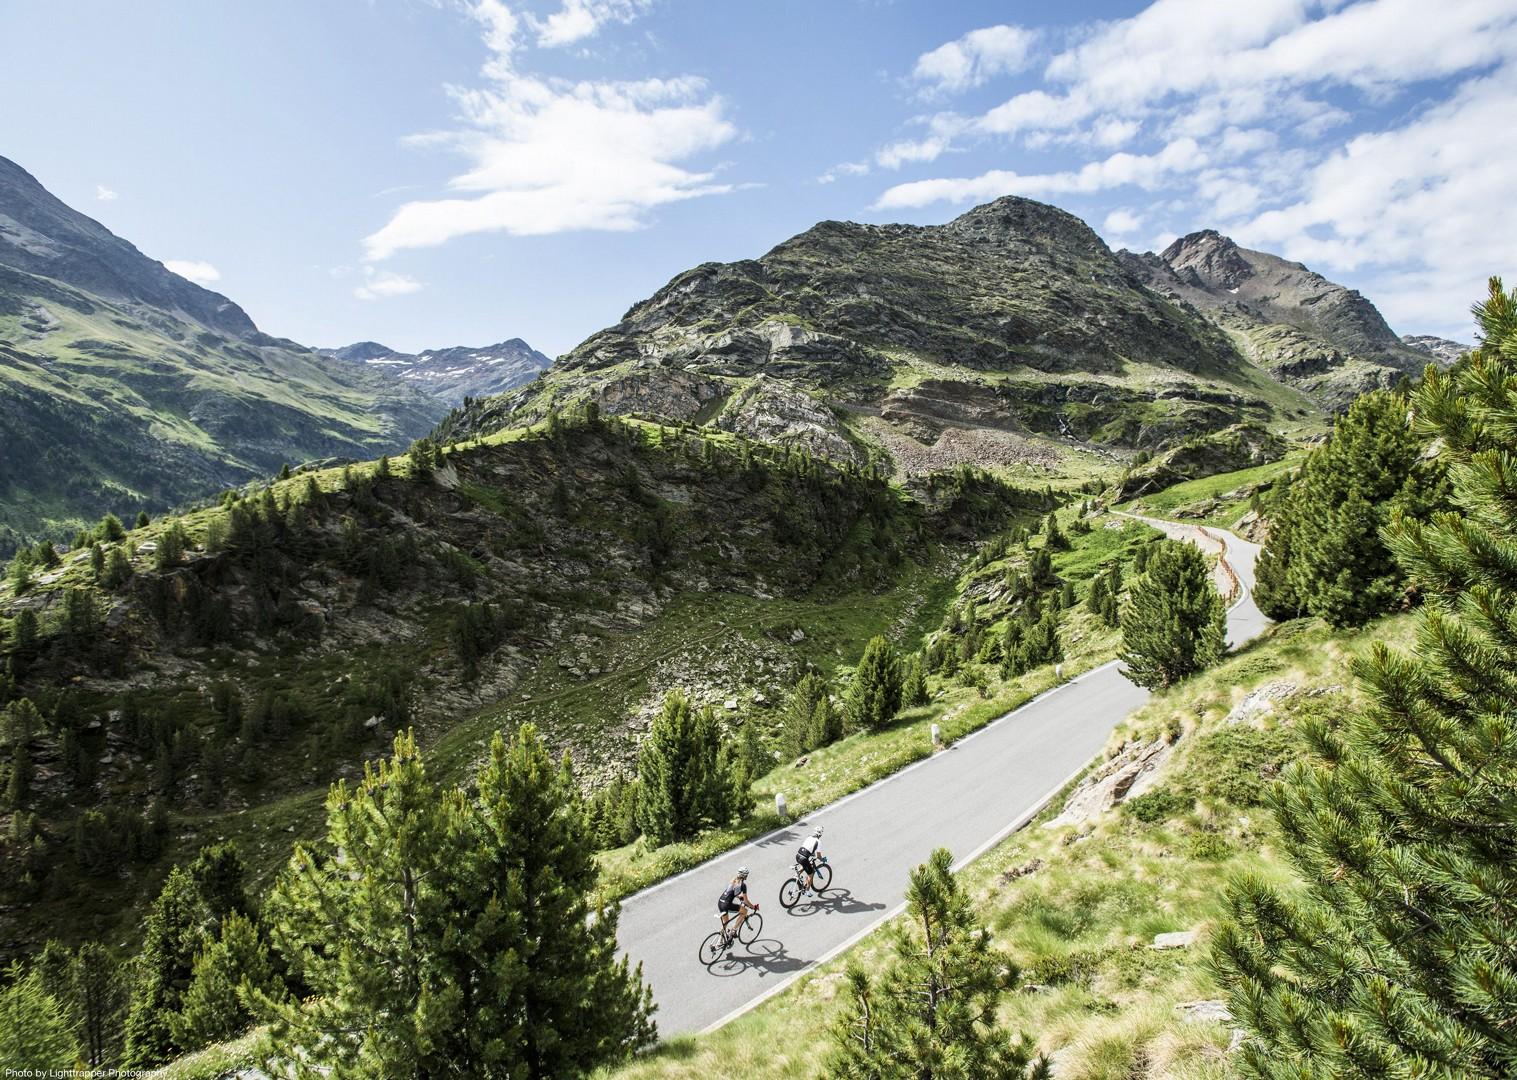 citta-alta-guided-road-cycling-holiday.jpg - Italy - Italian Alps - Guided Road Cycling Holiday - Road Cycling